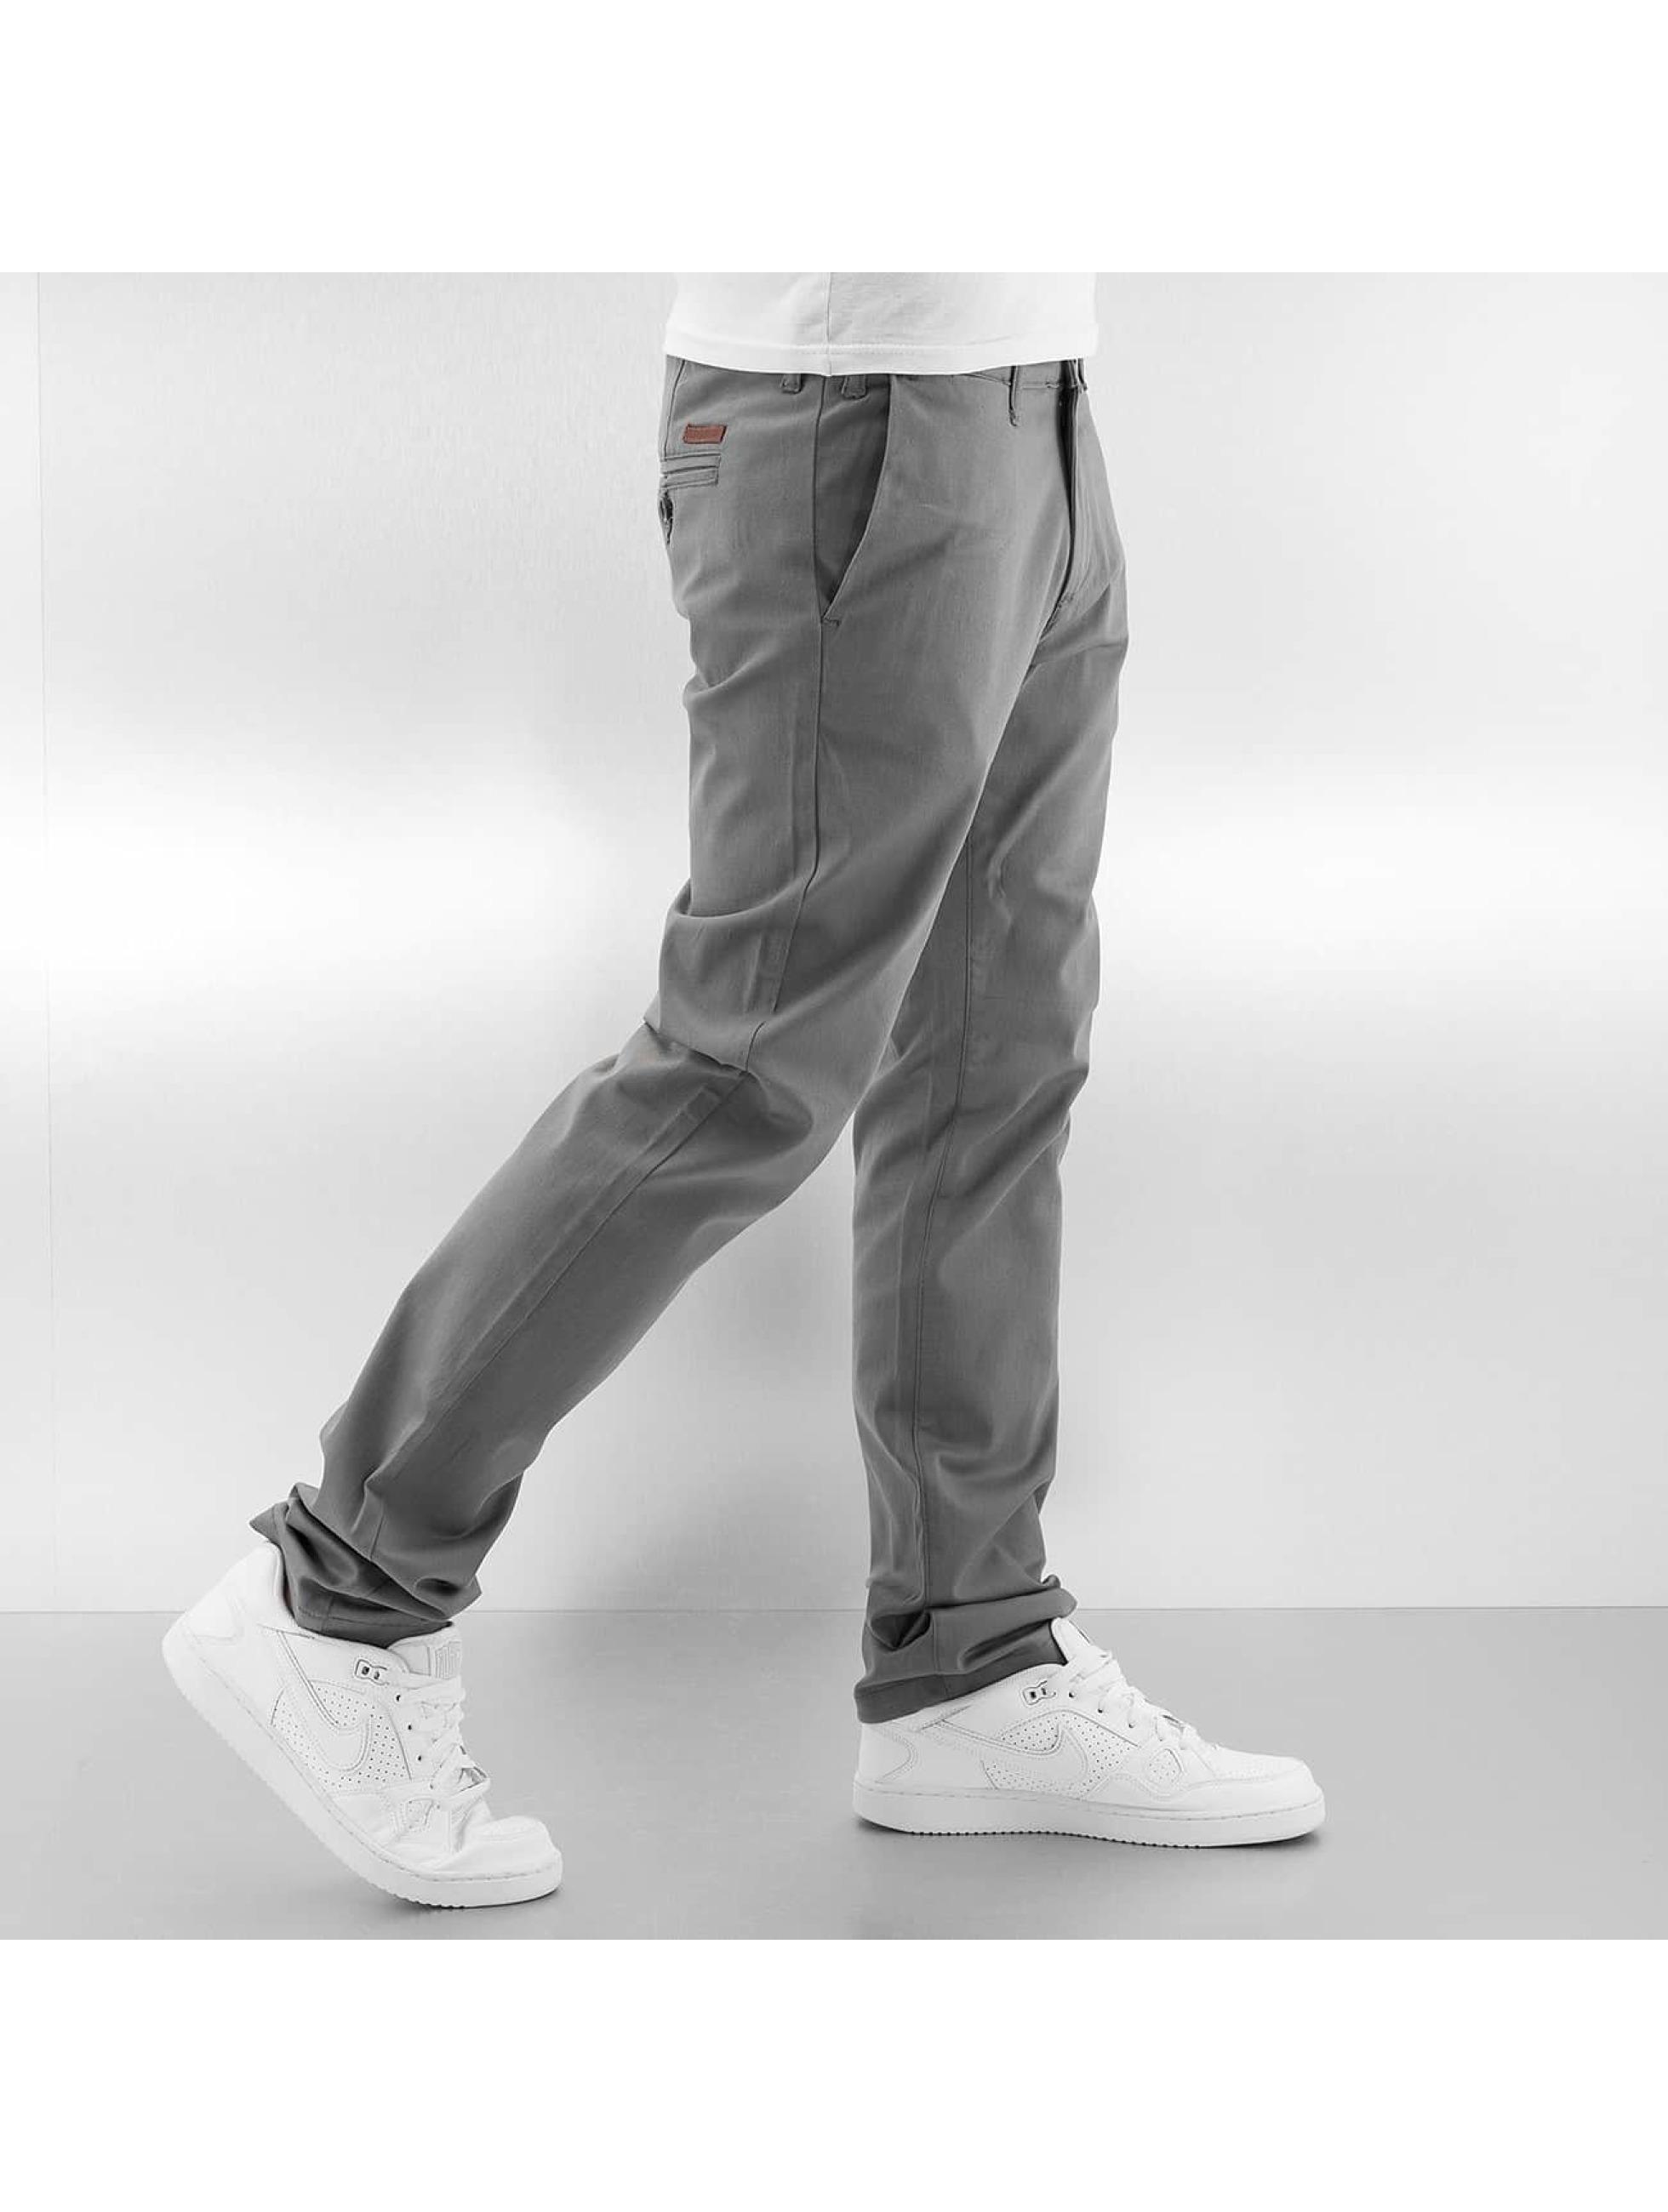 Rocawear Chino Slim Fit grijs